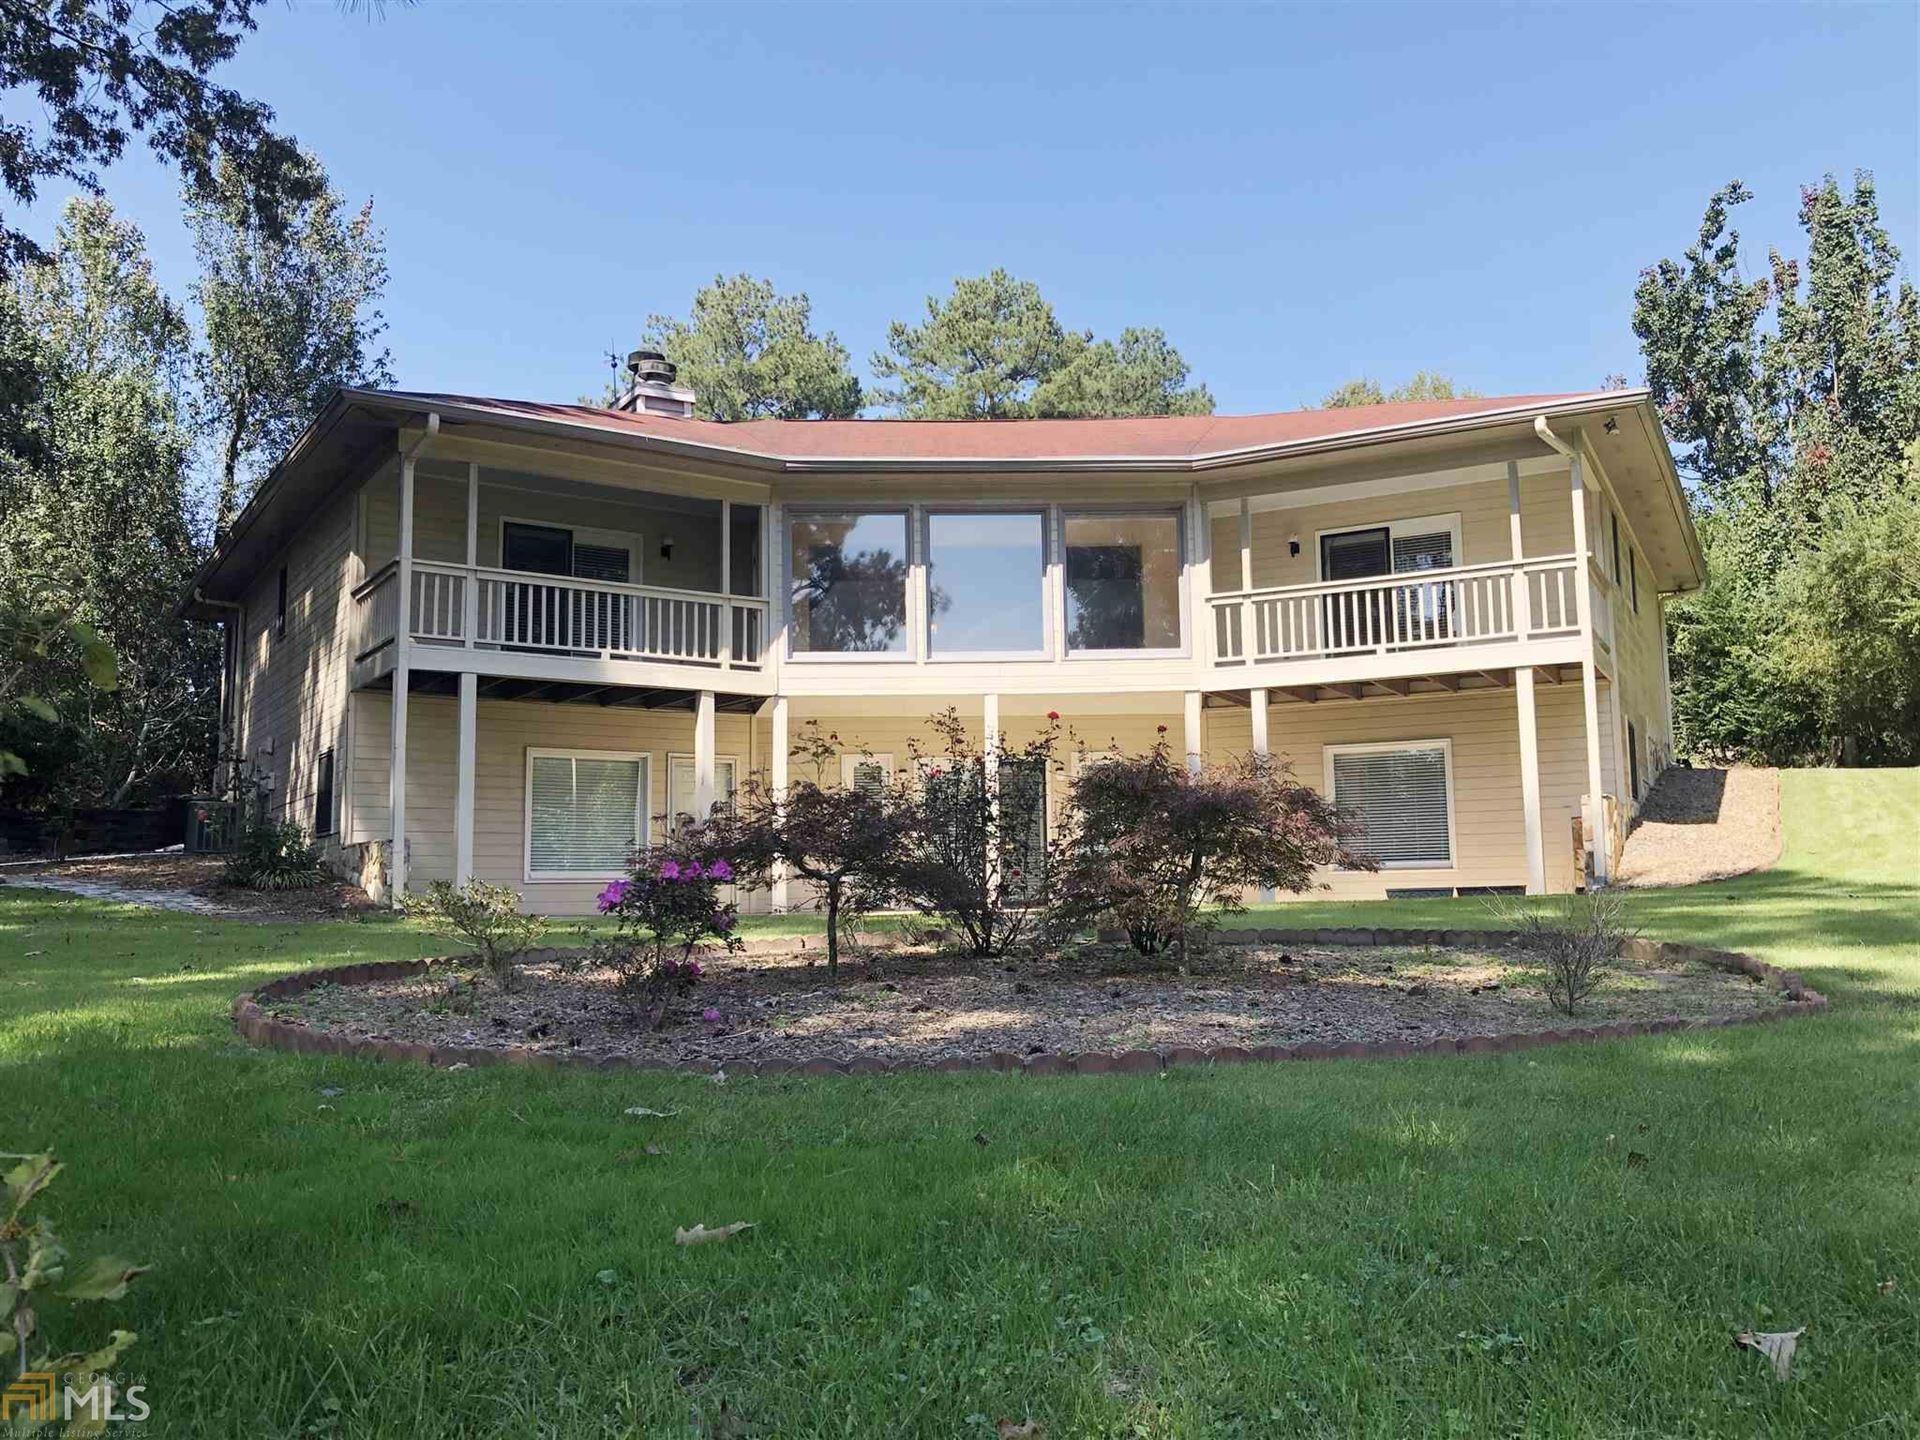 4464 Old Norcross Rd, Duluth, GA 30096 - #: 8869198